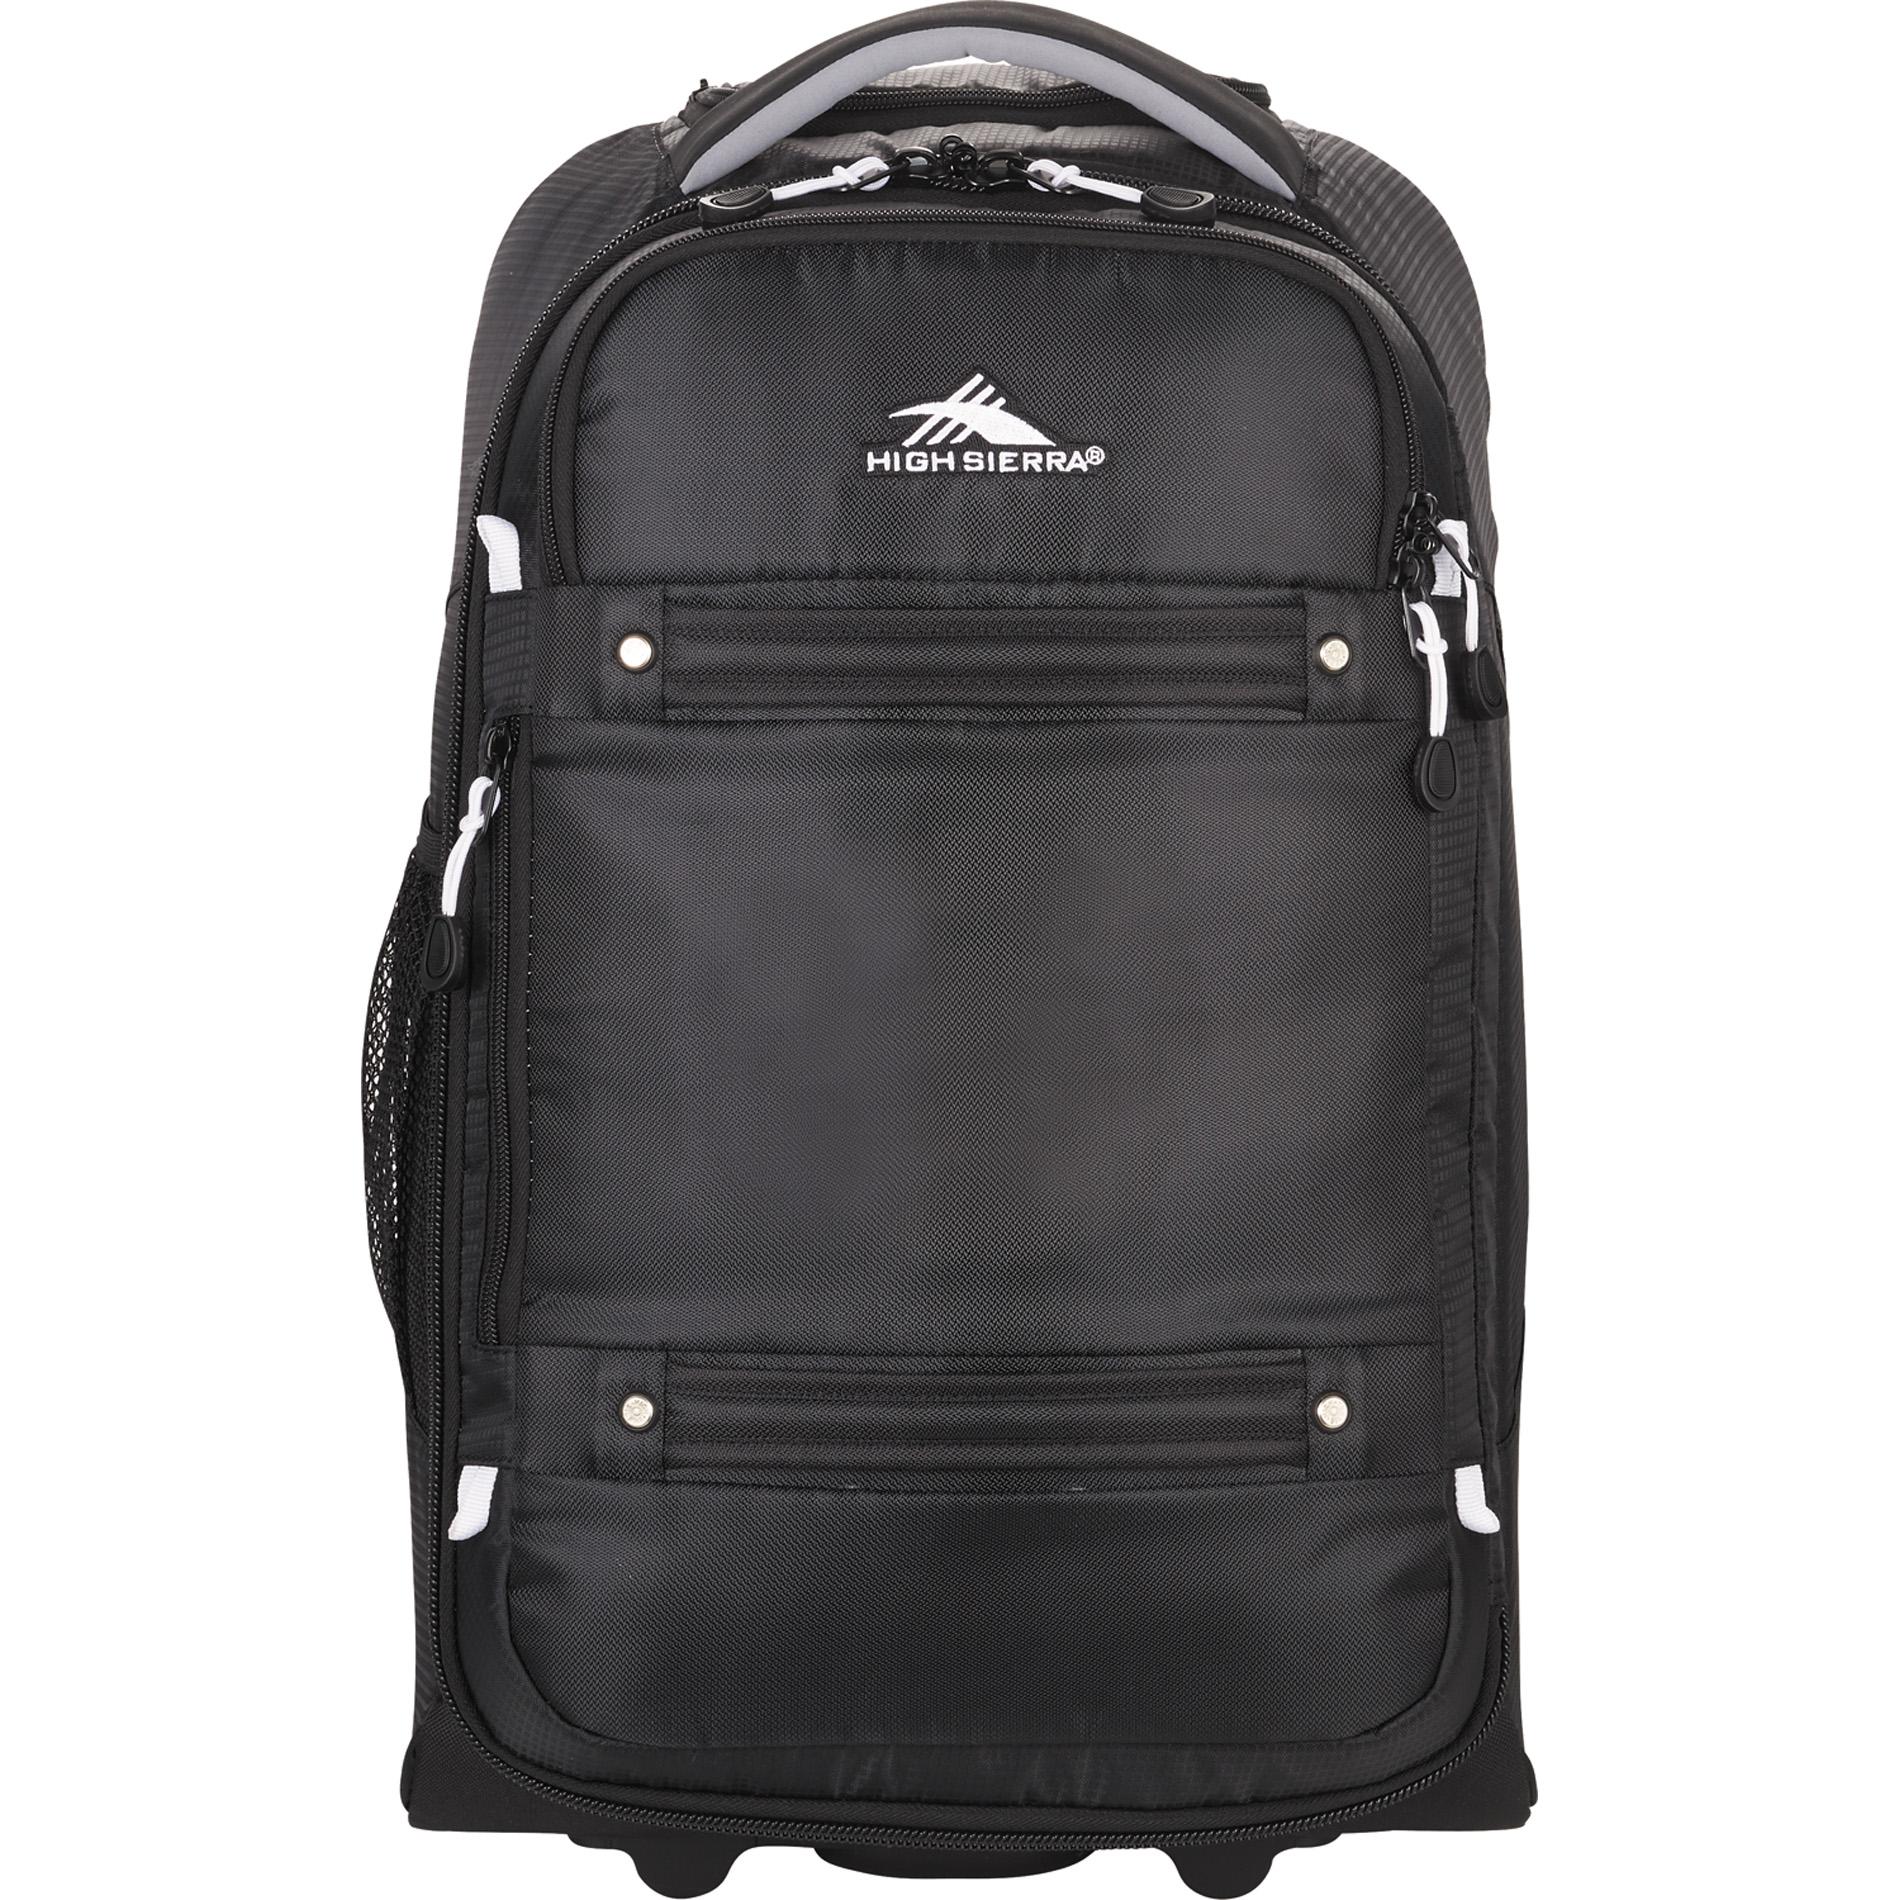 "High Sierra 8052-95 - Composite 21"" Carry-On"